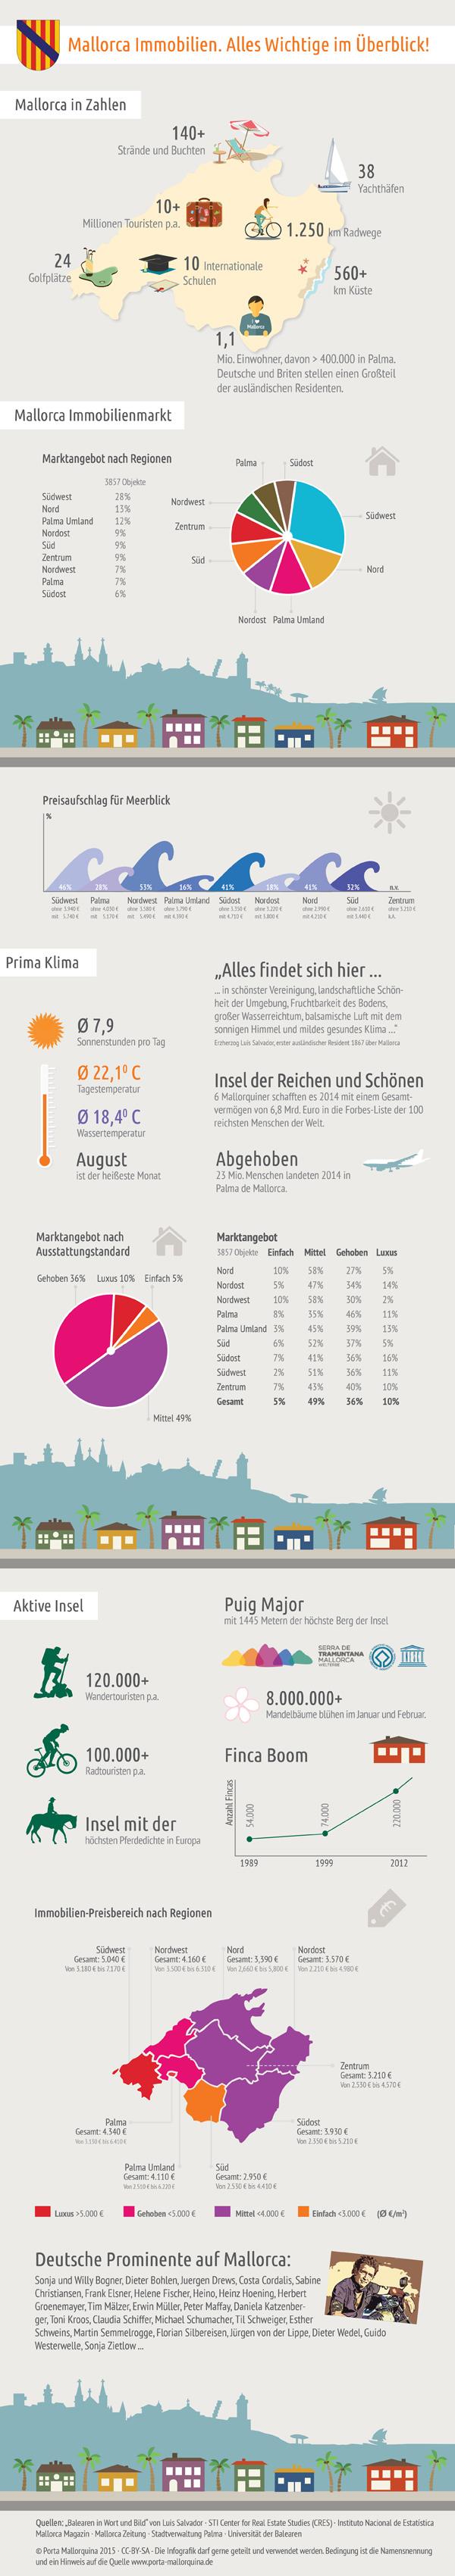 Infografik Mallorca Immobilien - Alles Wichtige im Überblick